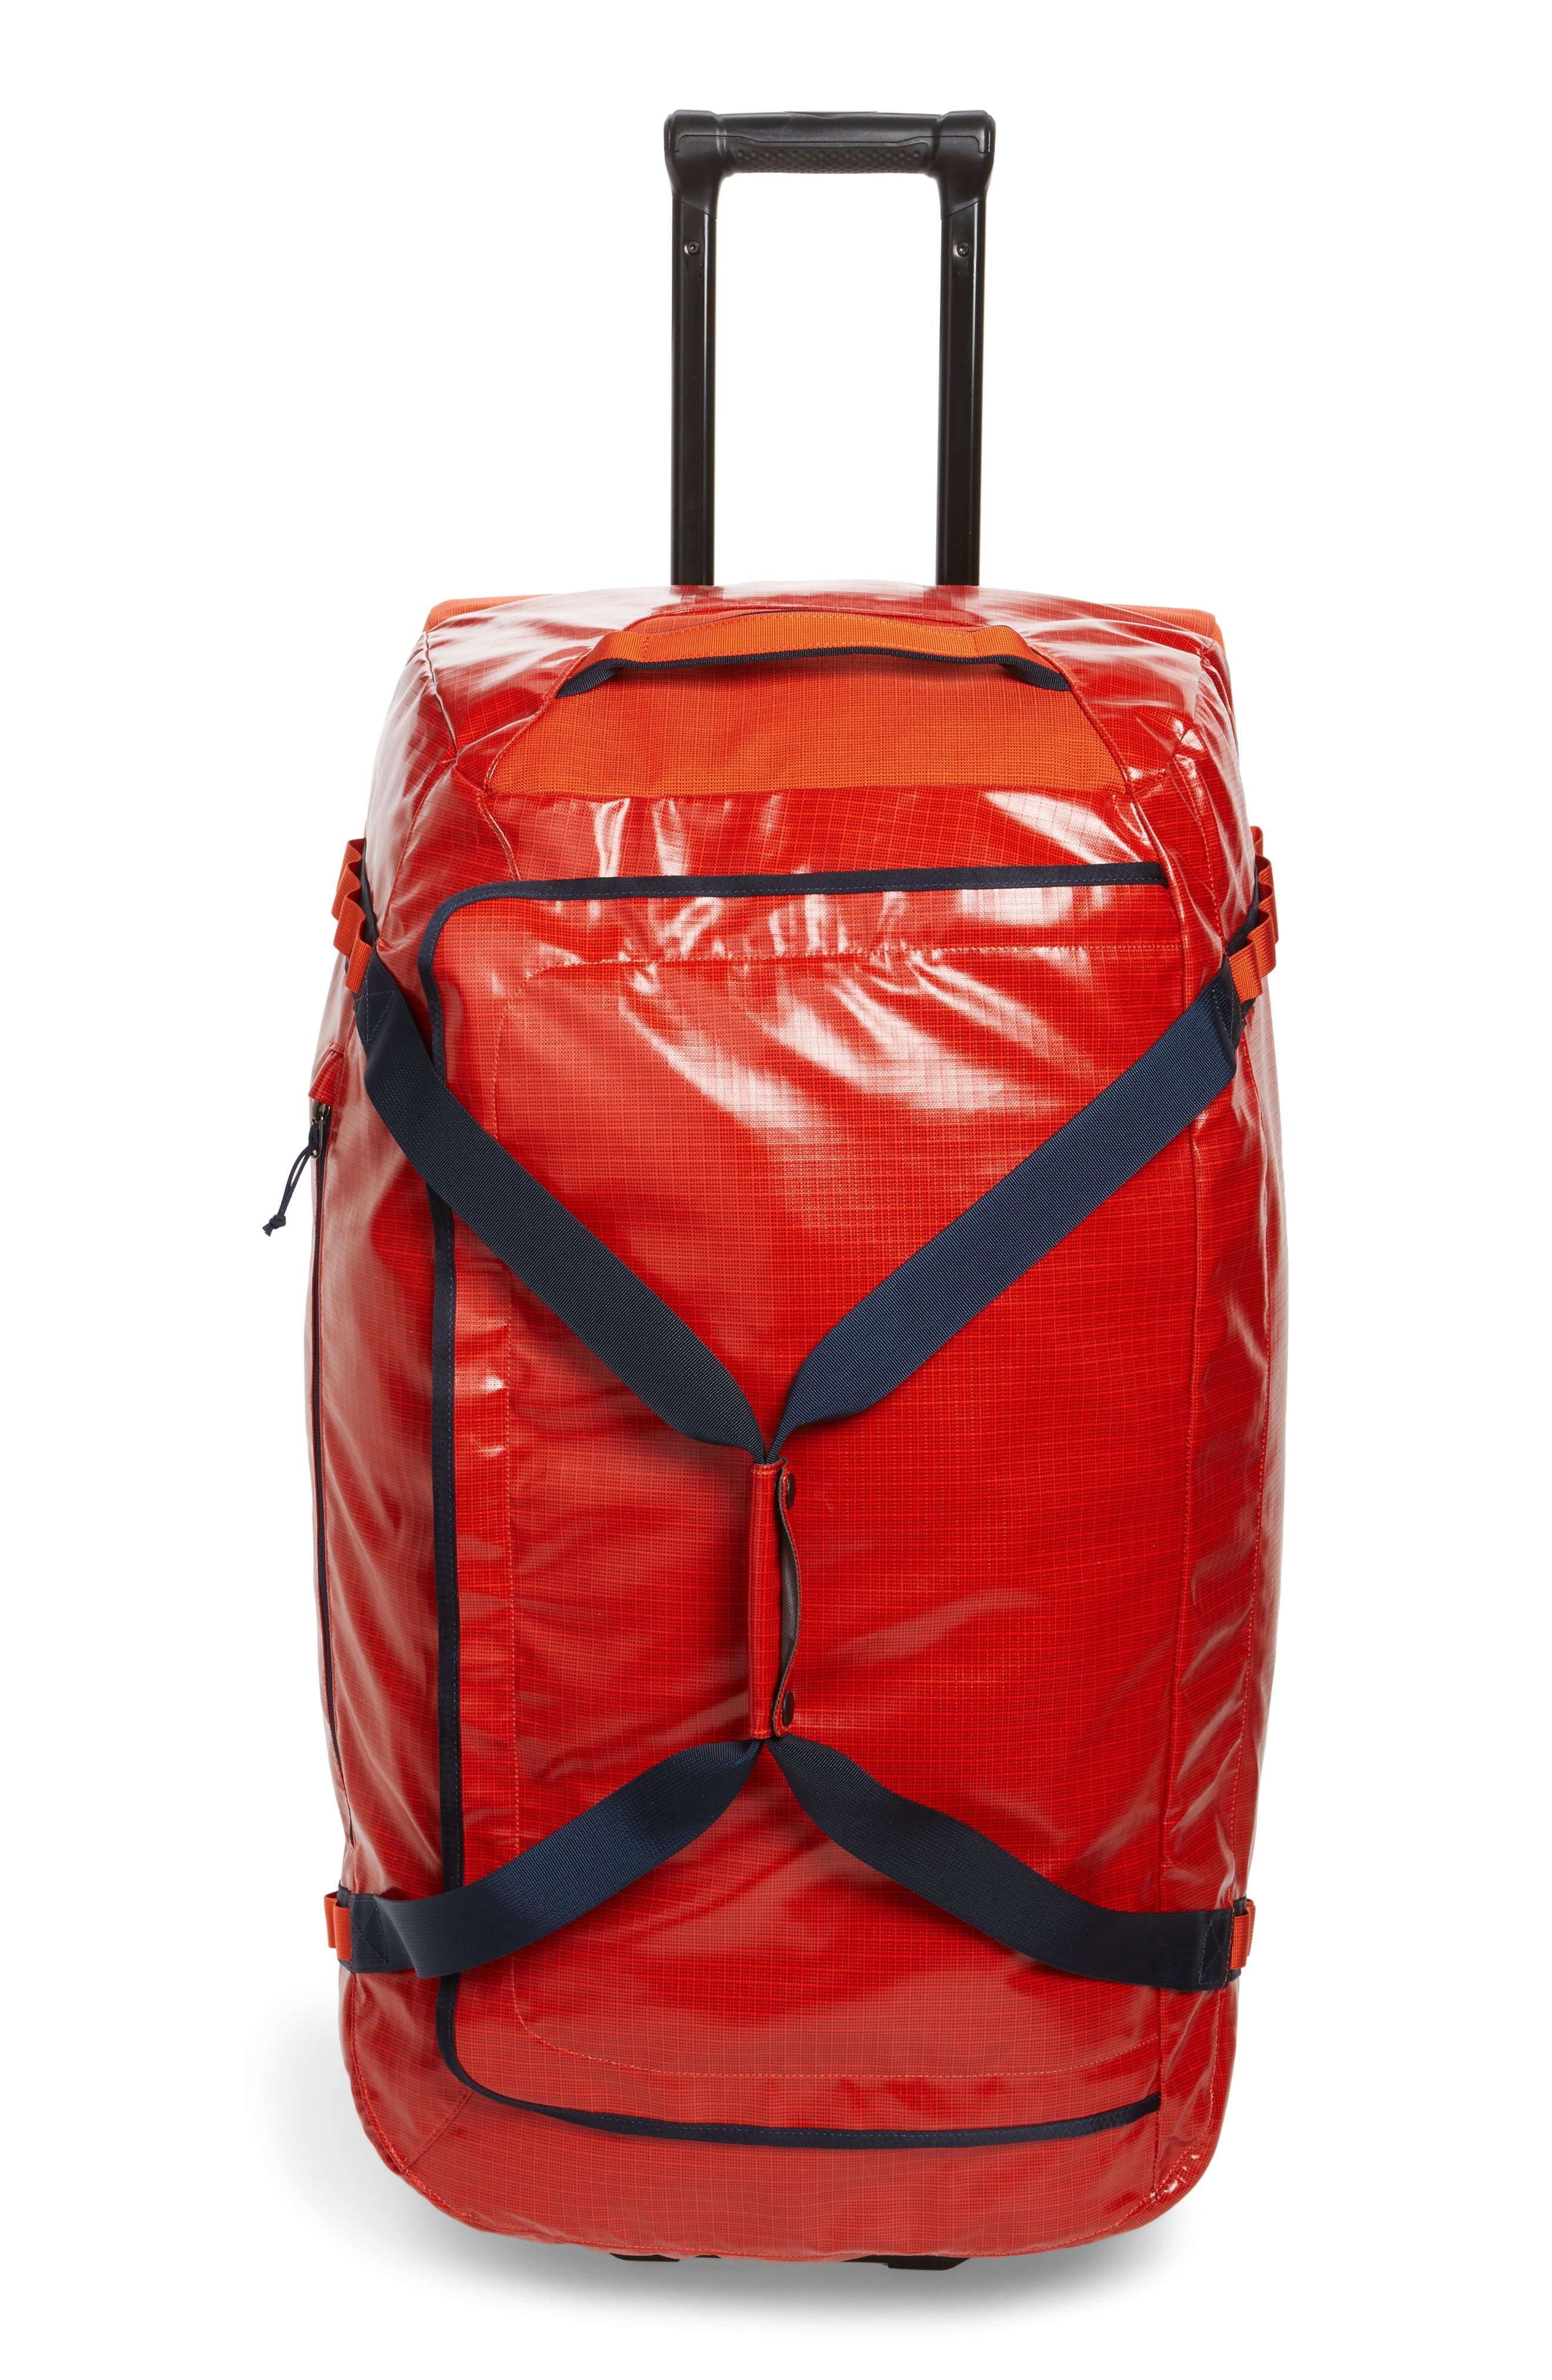 Patagonia 'Black Hole™' RollingDuffel Bag (120 Liter)